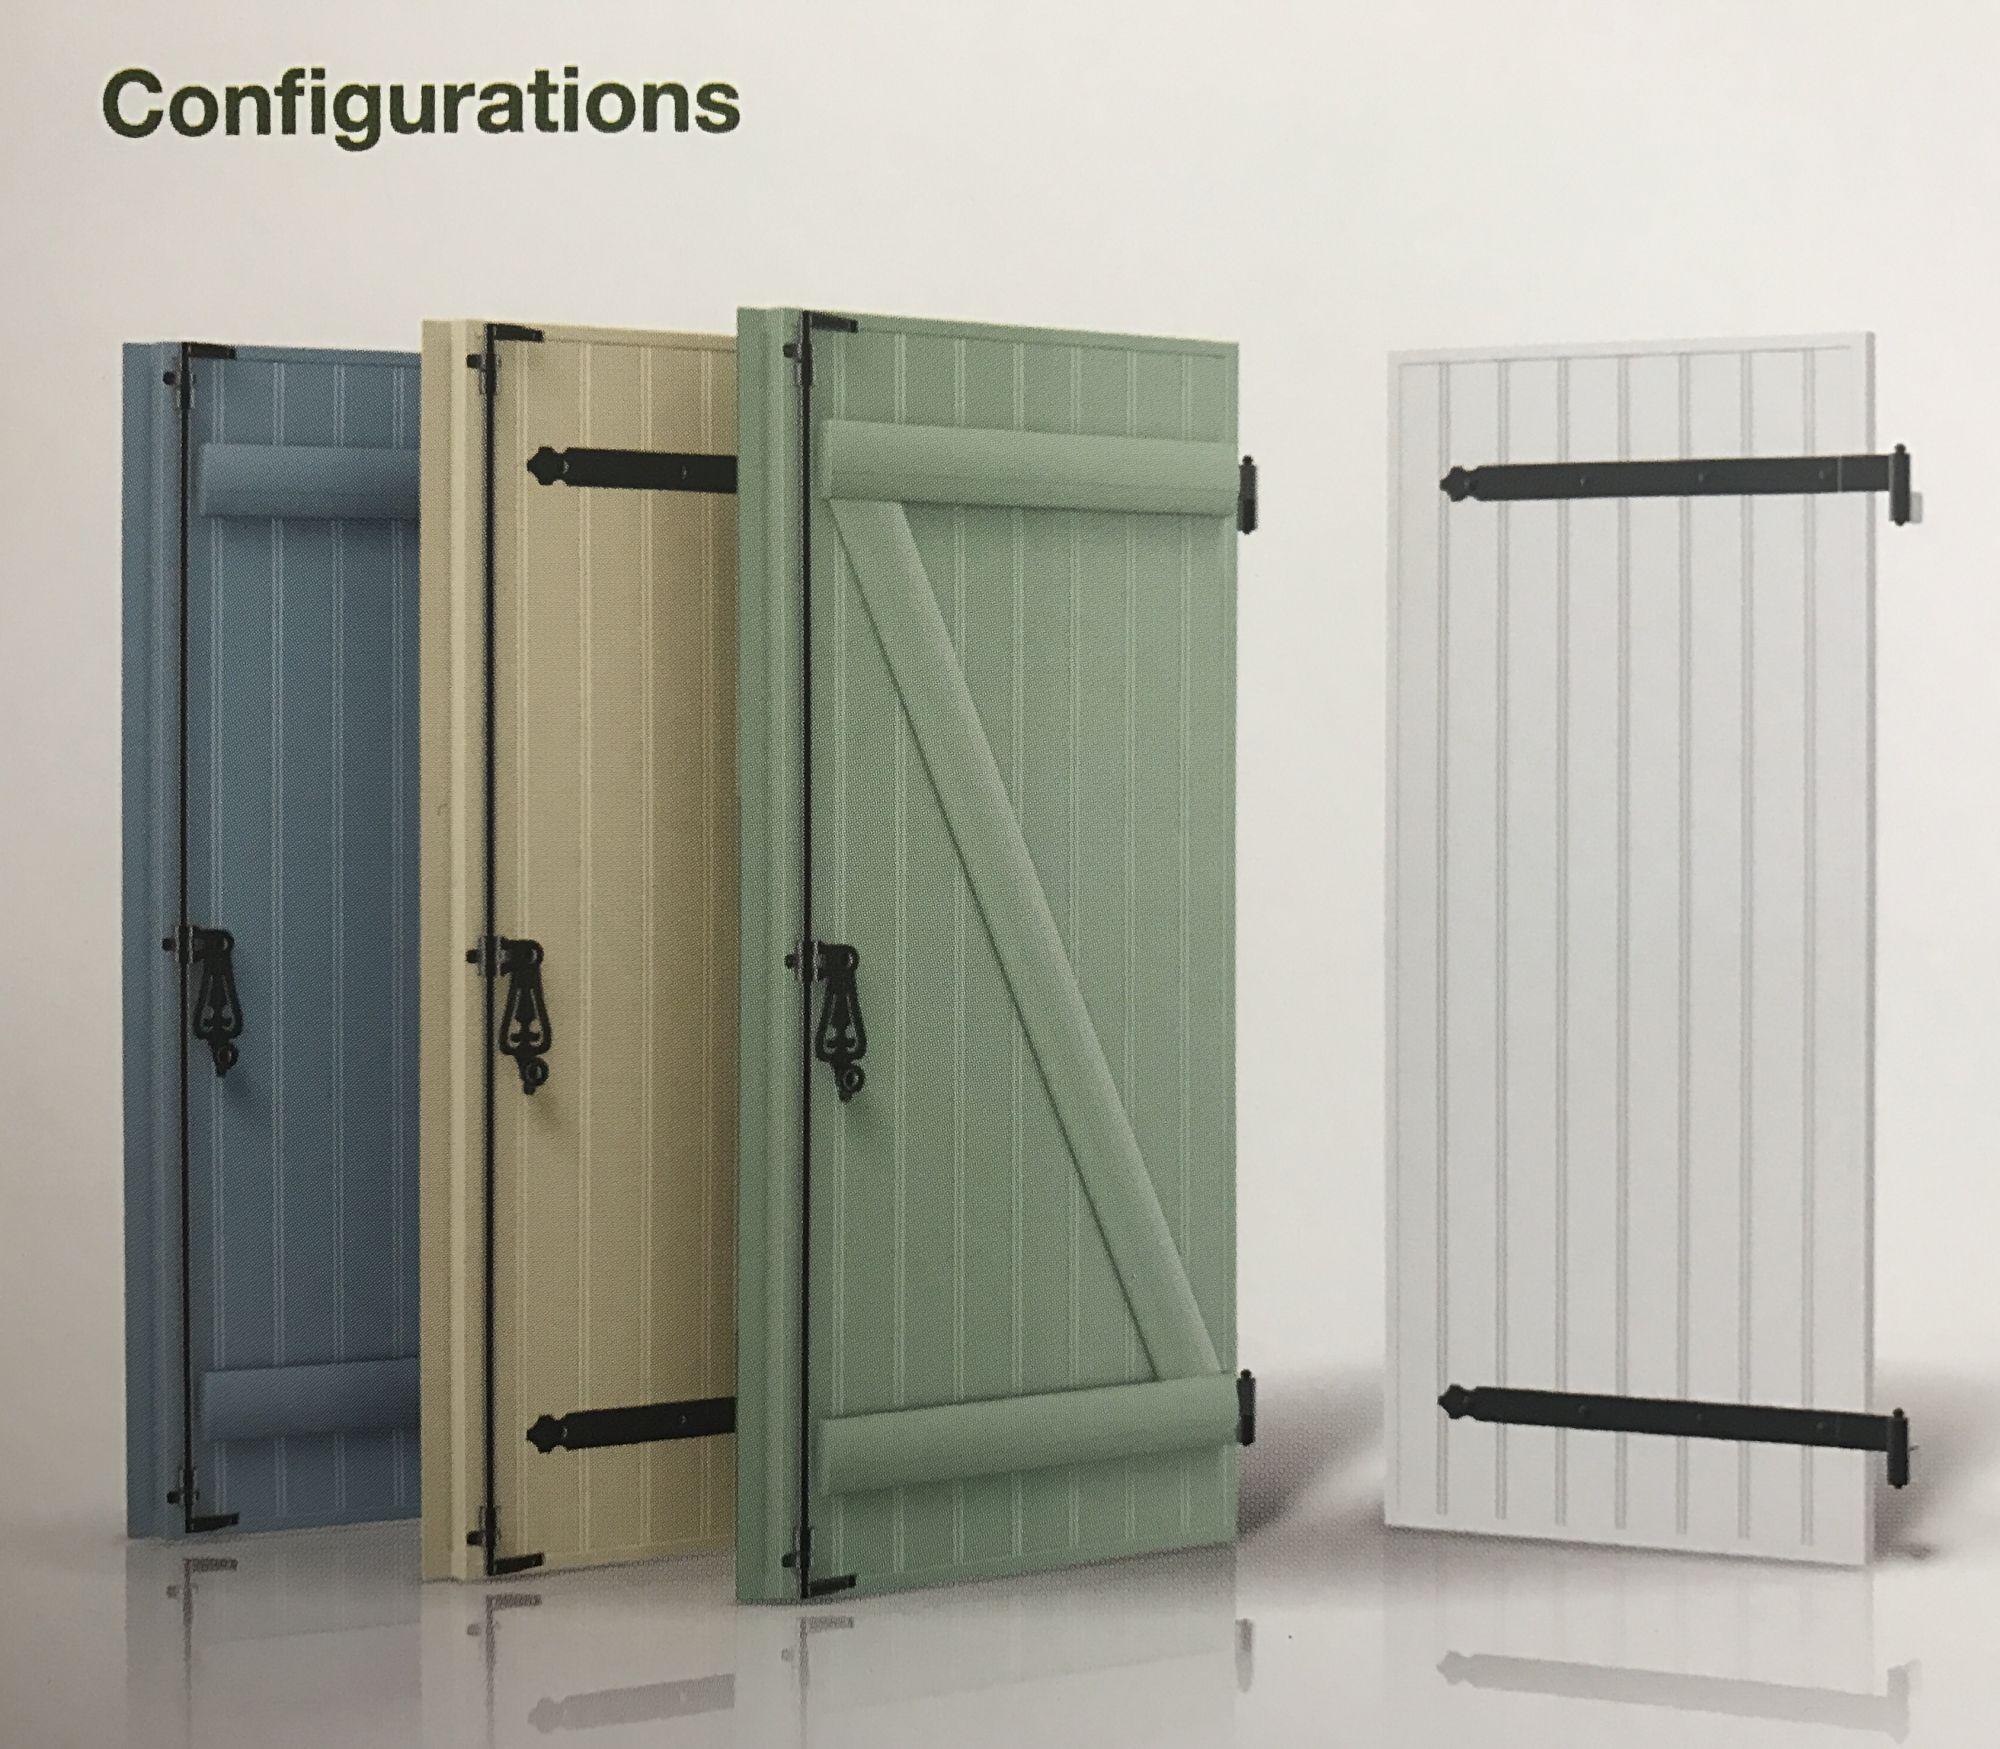 accessoires volets battants pvc. Black Bedroom Furniture Sets. Home Design Ideas